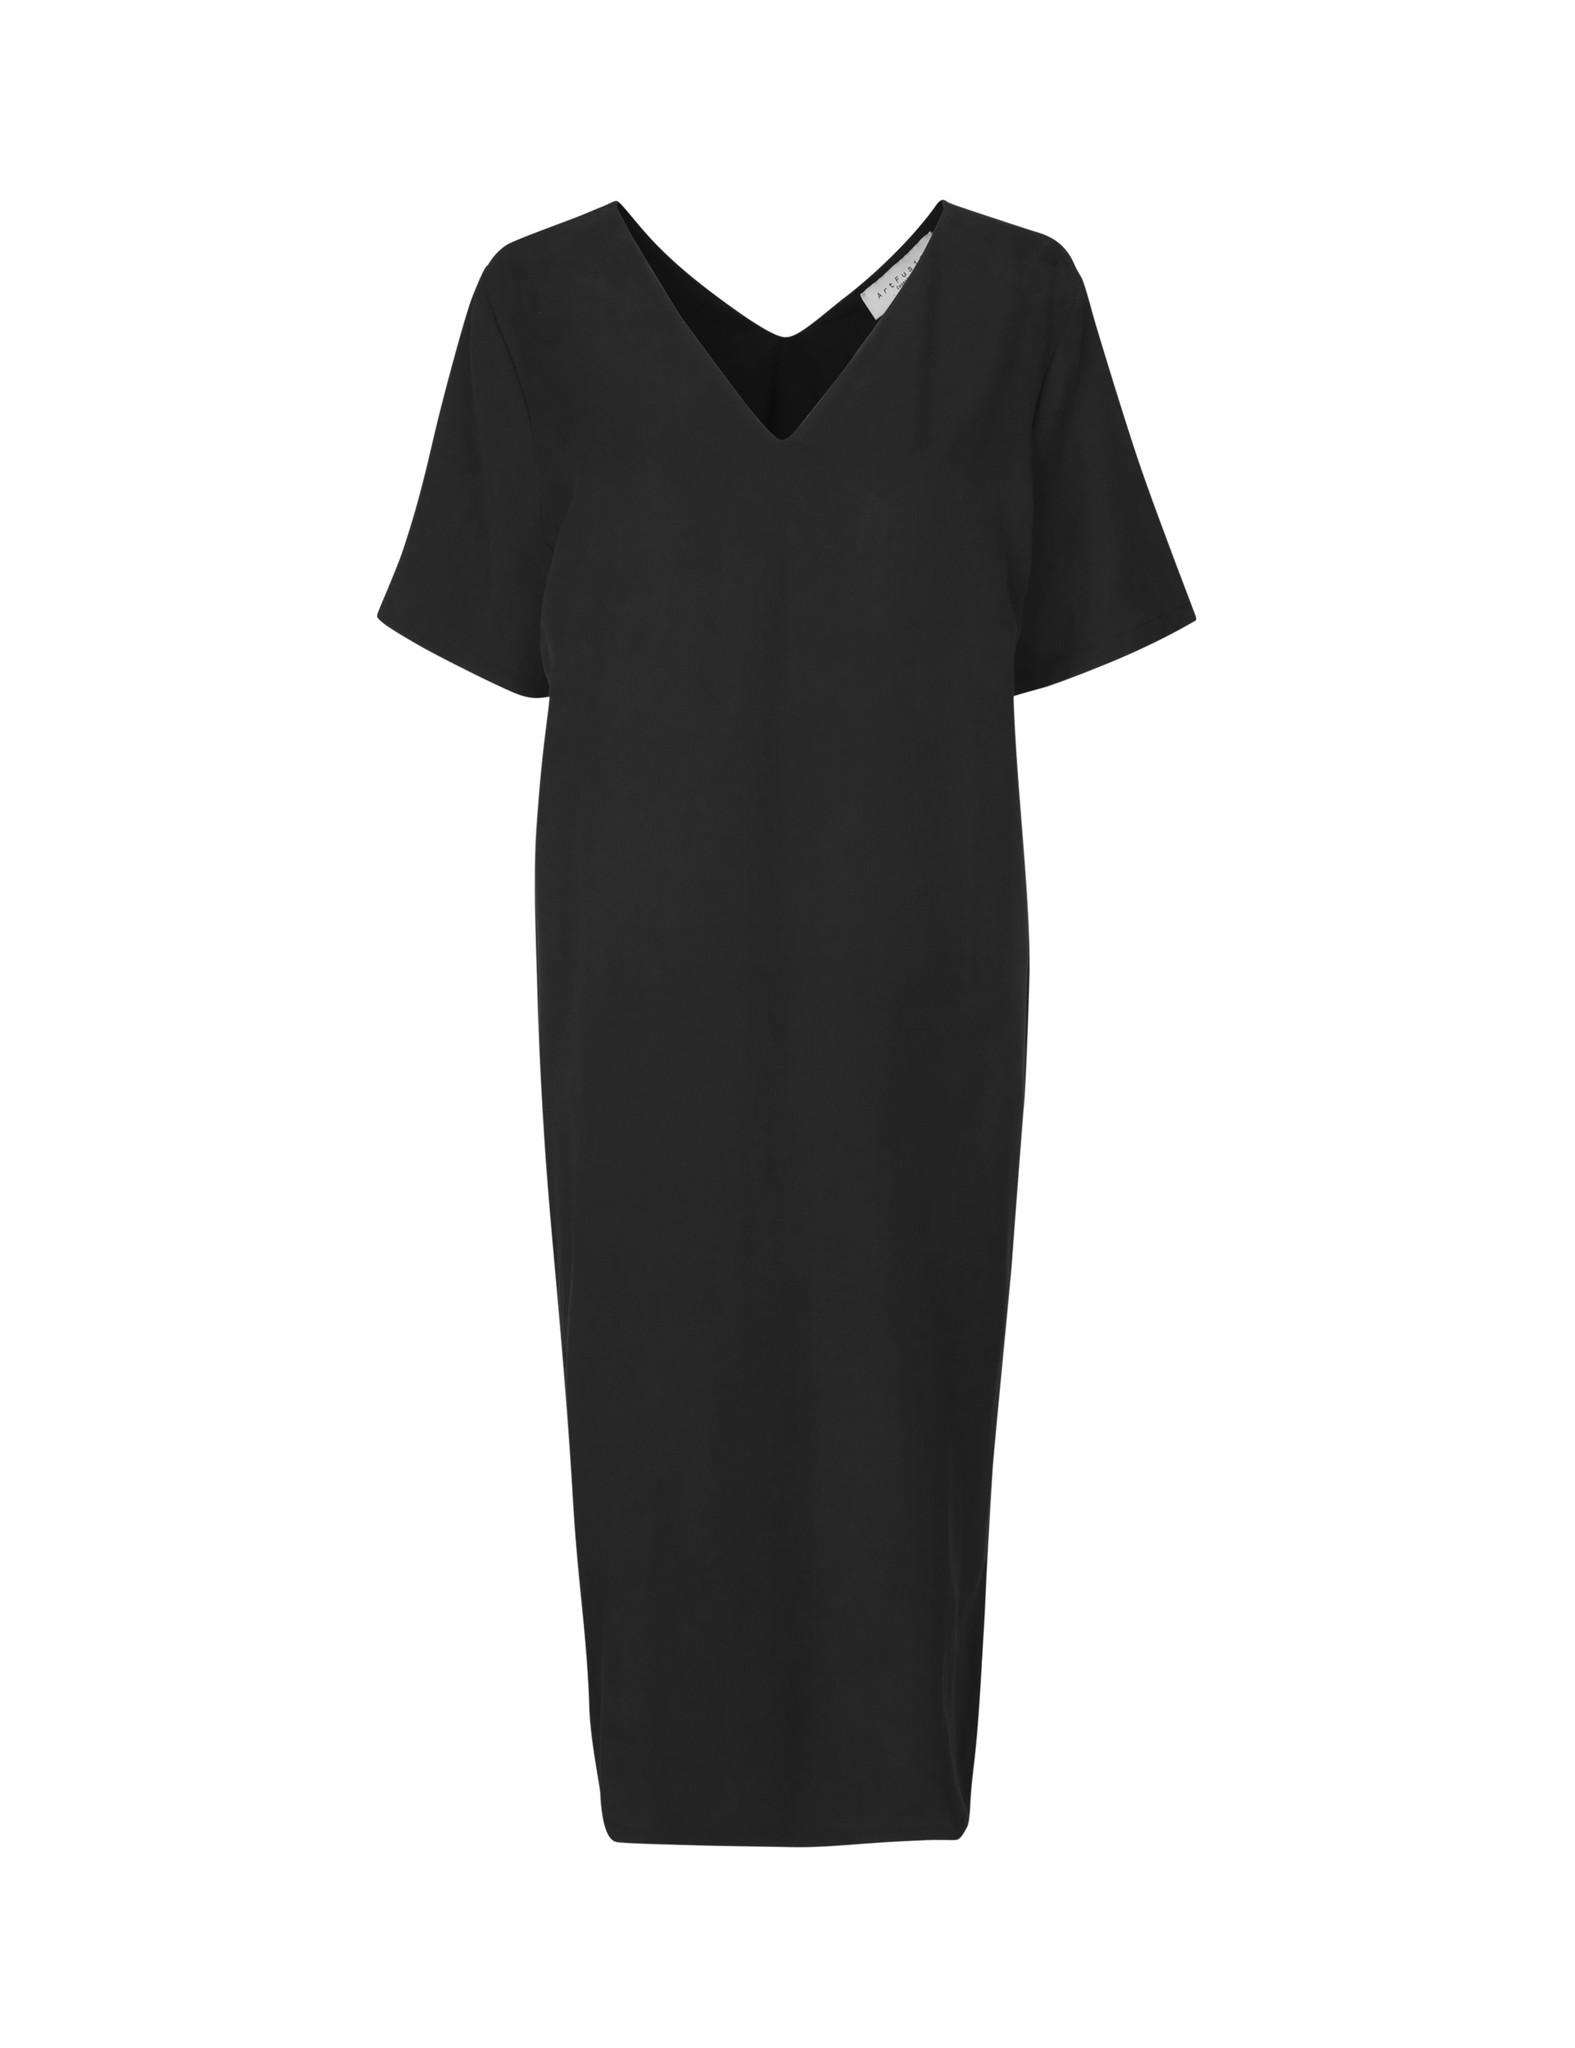 Vinnie Dress Black Lyocell-1